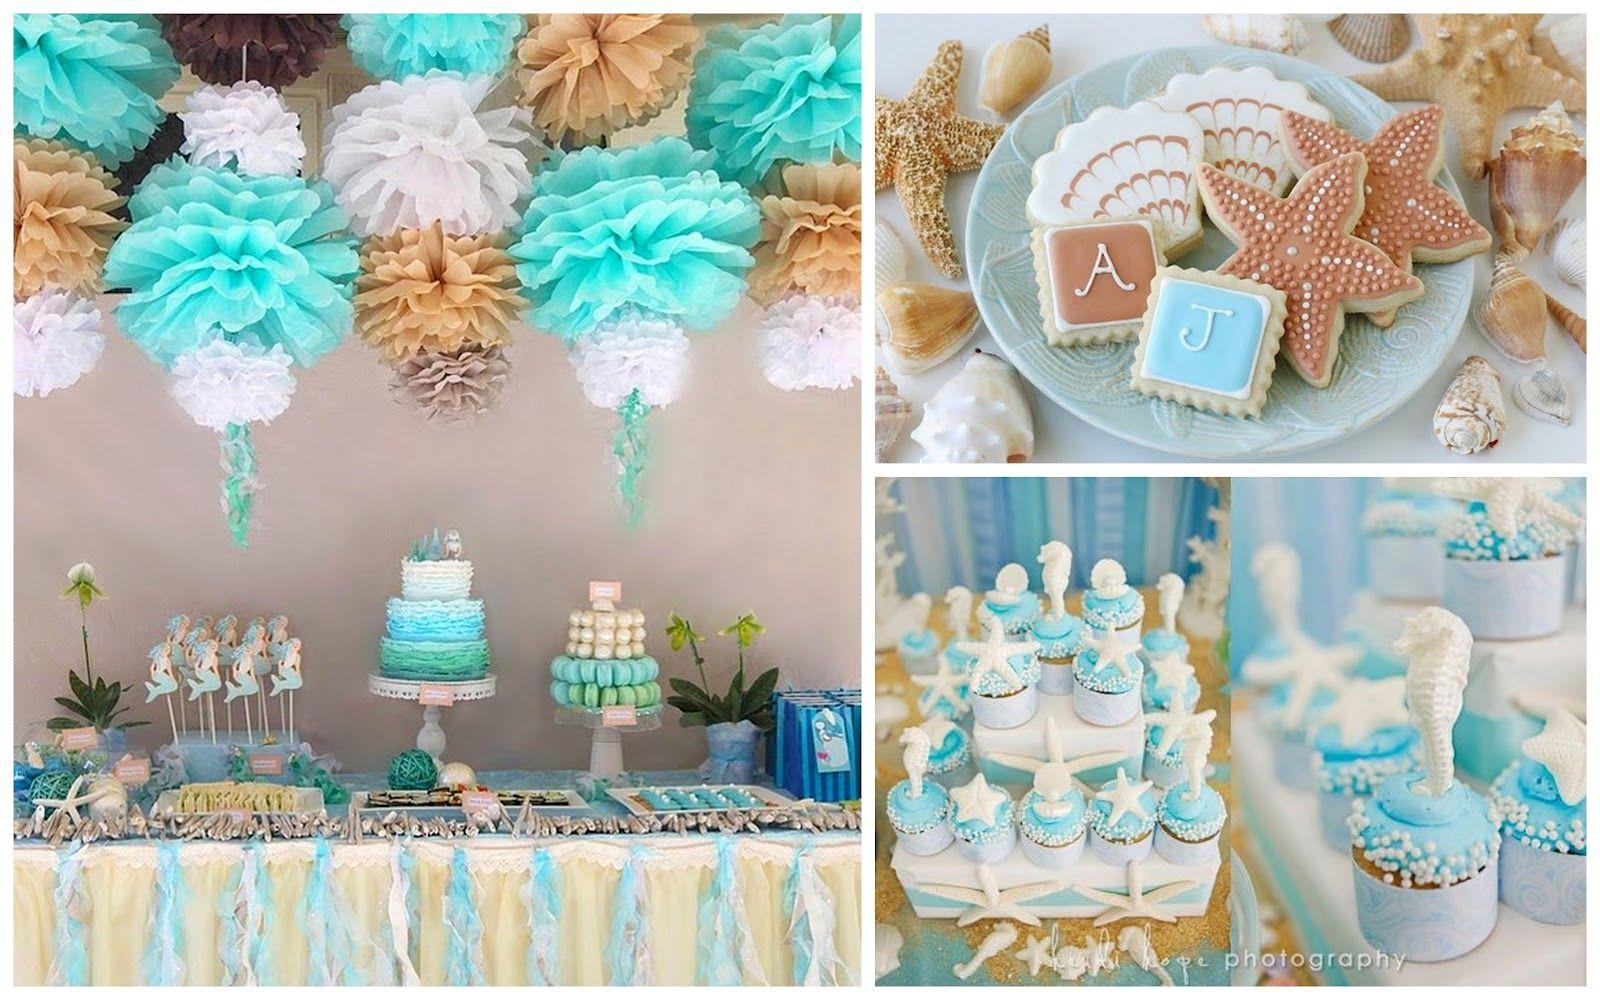 Beach Theme Party Decorations Ideas Part - 29: Sunny Sweet Life: Beach-Themed Party Ideas